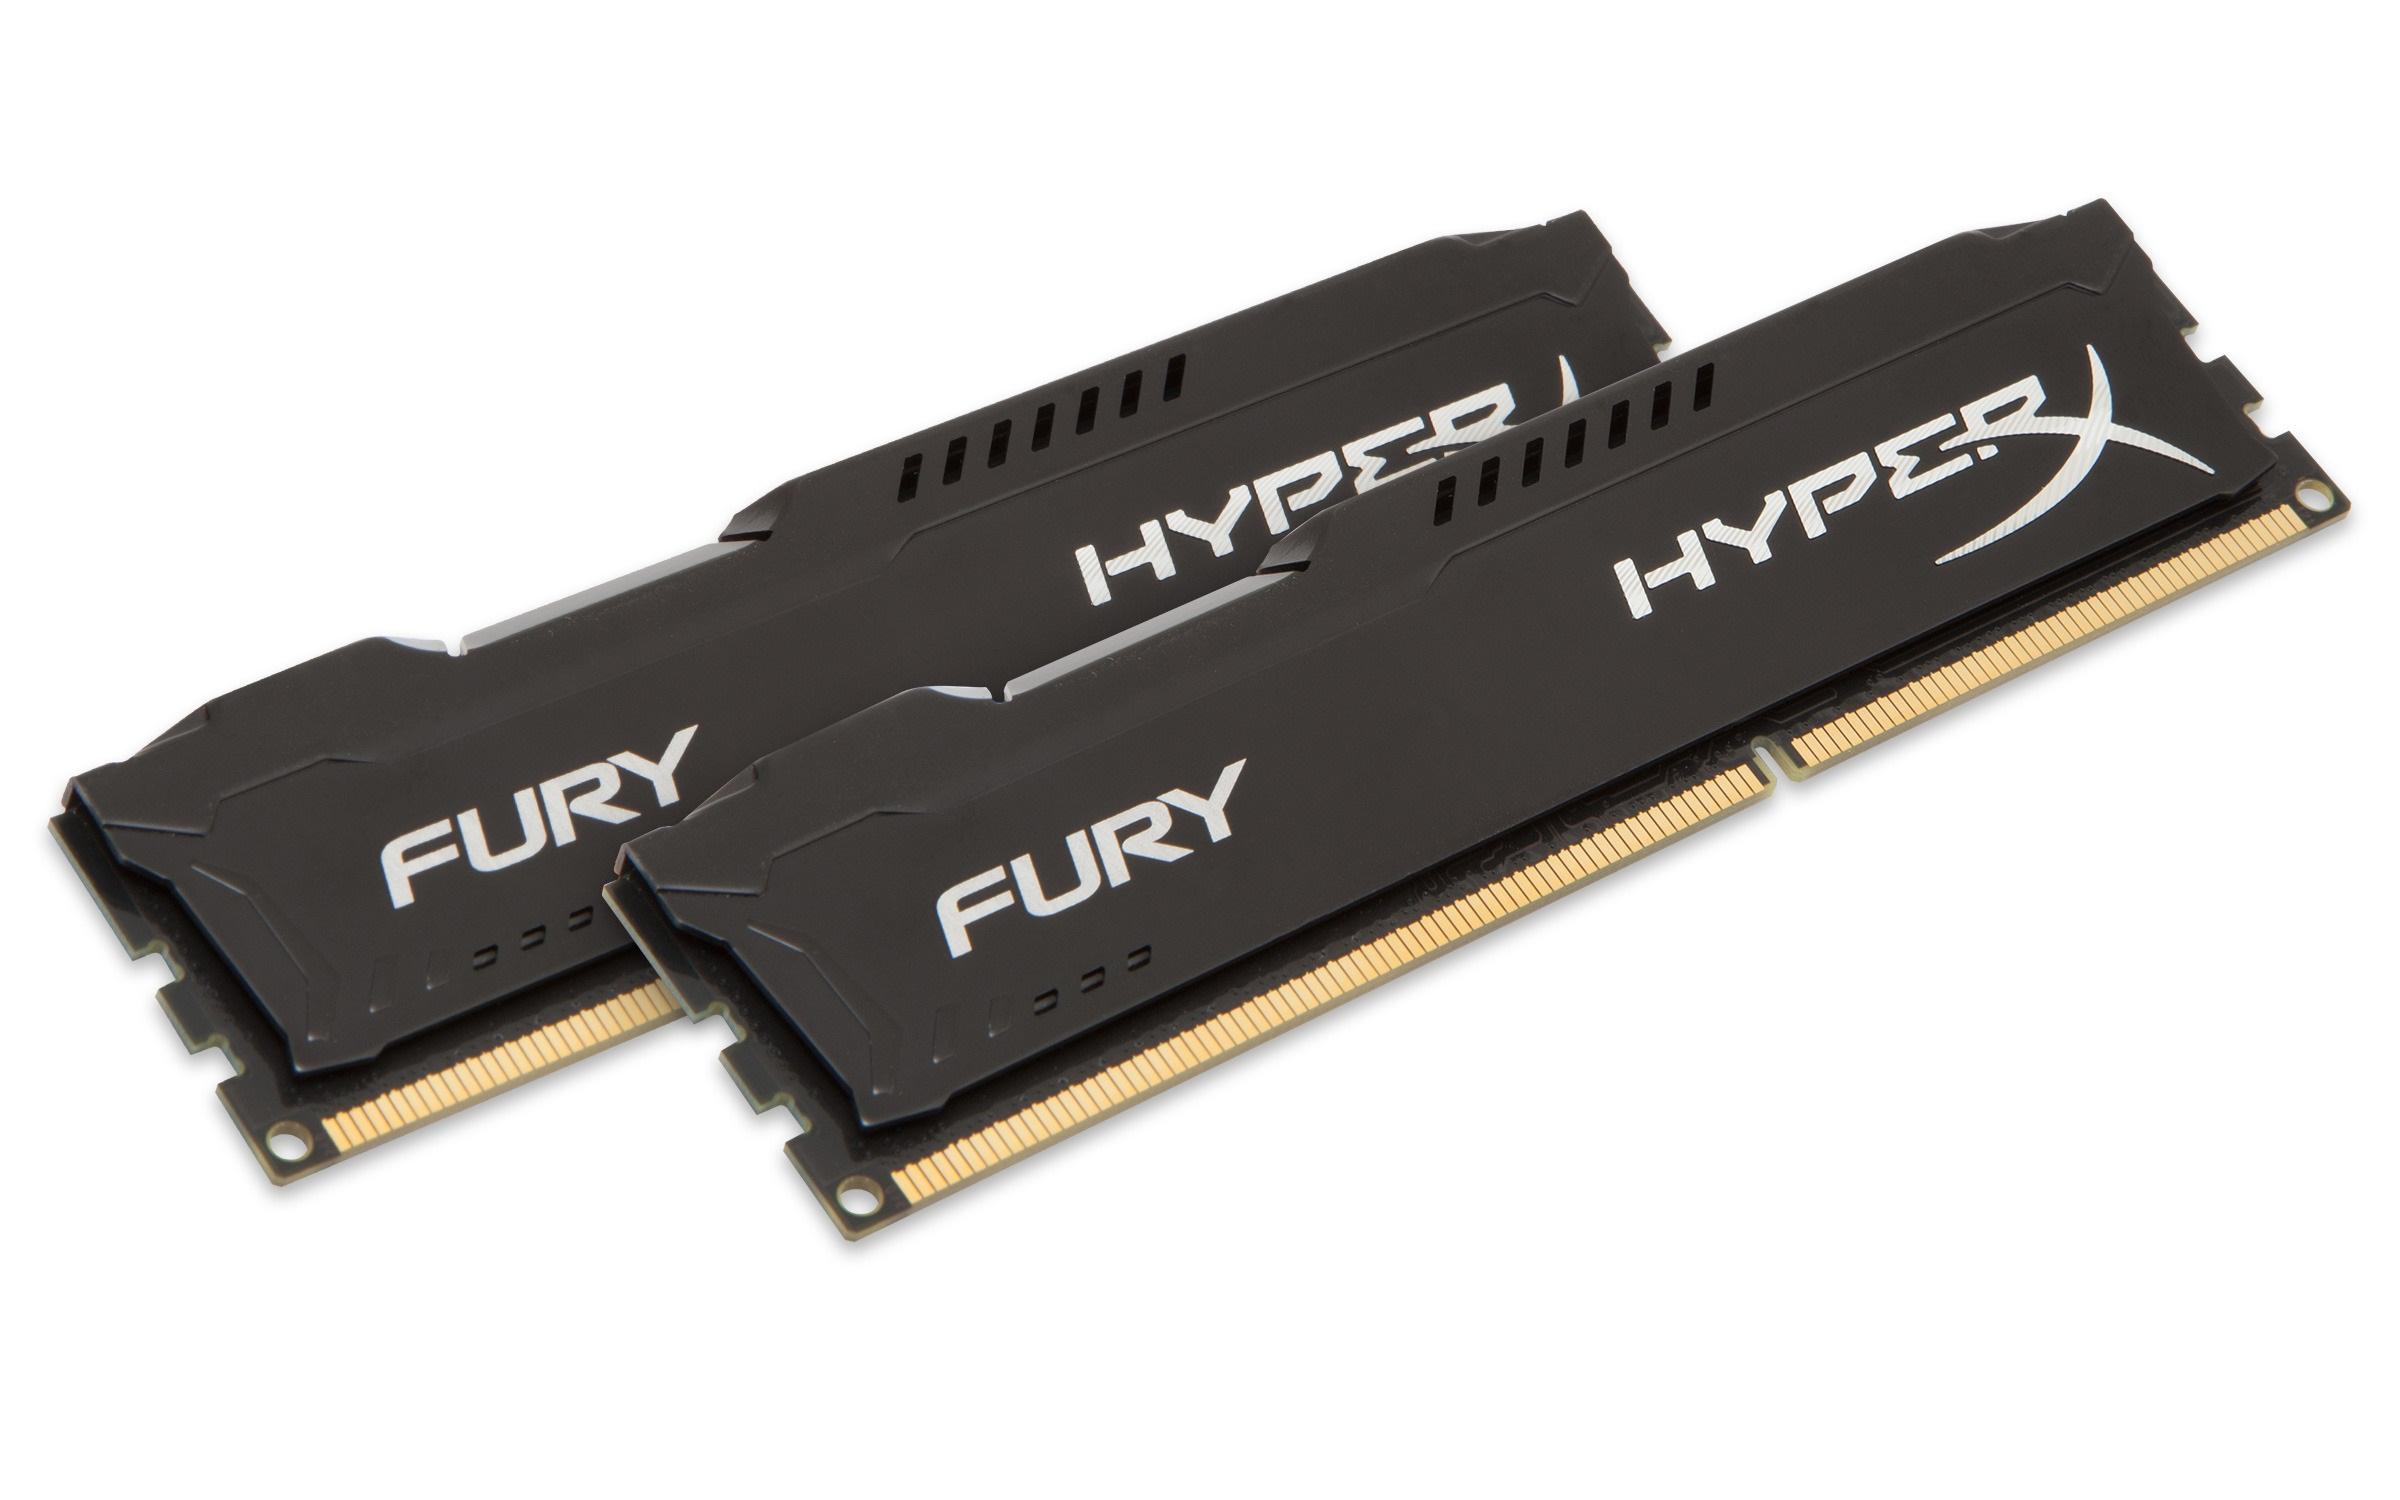 KINGSTON 8GB 1600MHz DDR3 CL10 DIMM (Kit of 2) HyperX FURY Black Series